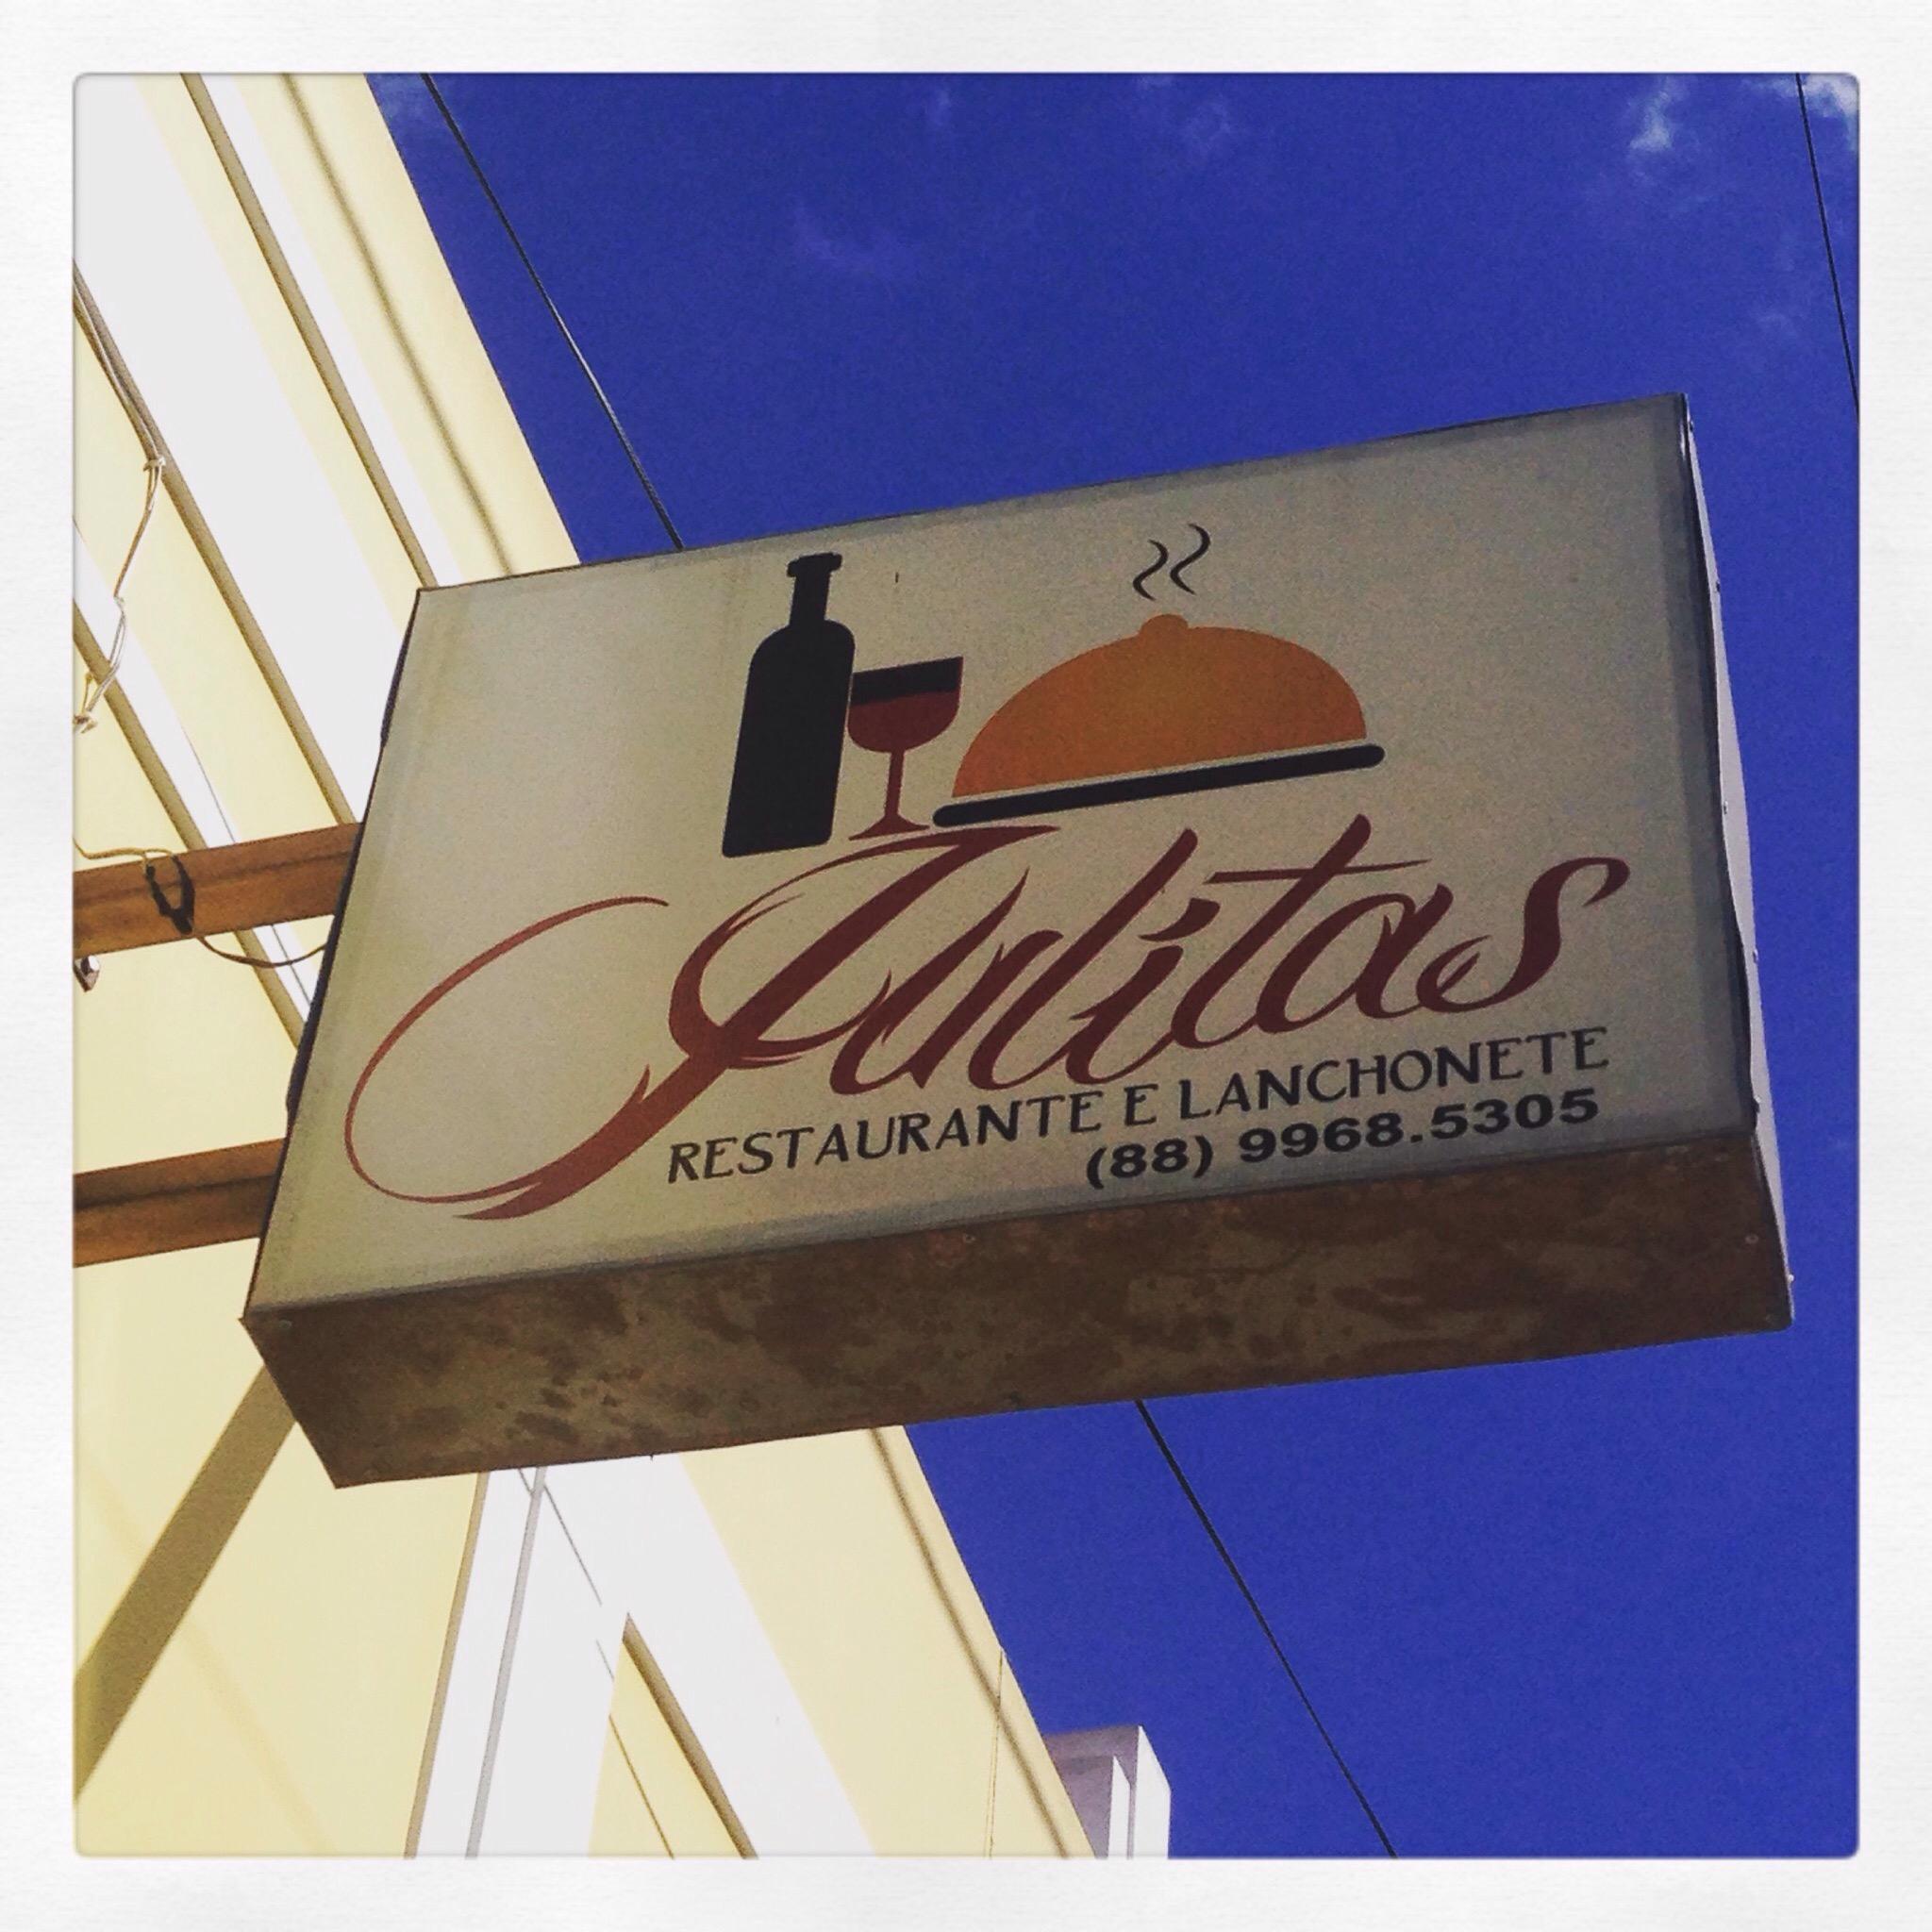 Restaurante E Lanchonete - Julita's